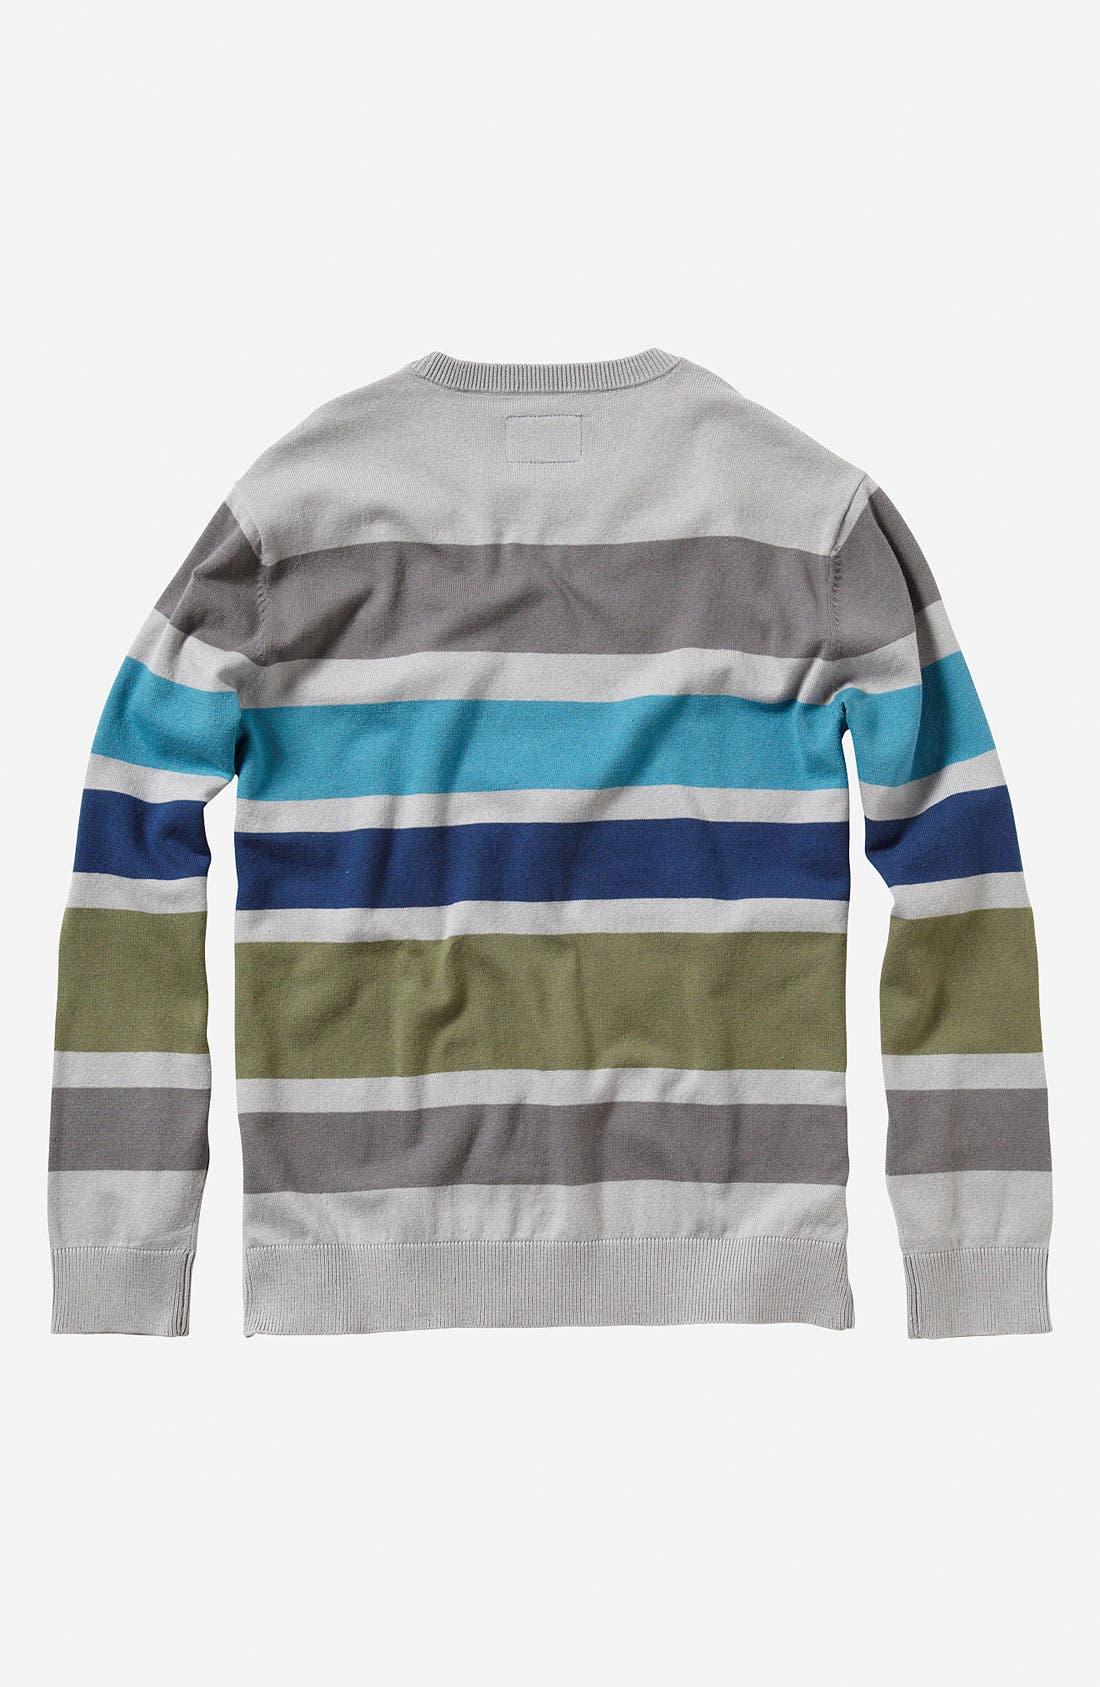 Alternate Image 2  - Quiksilver 'Casting' Sweater (Little Boys)